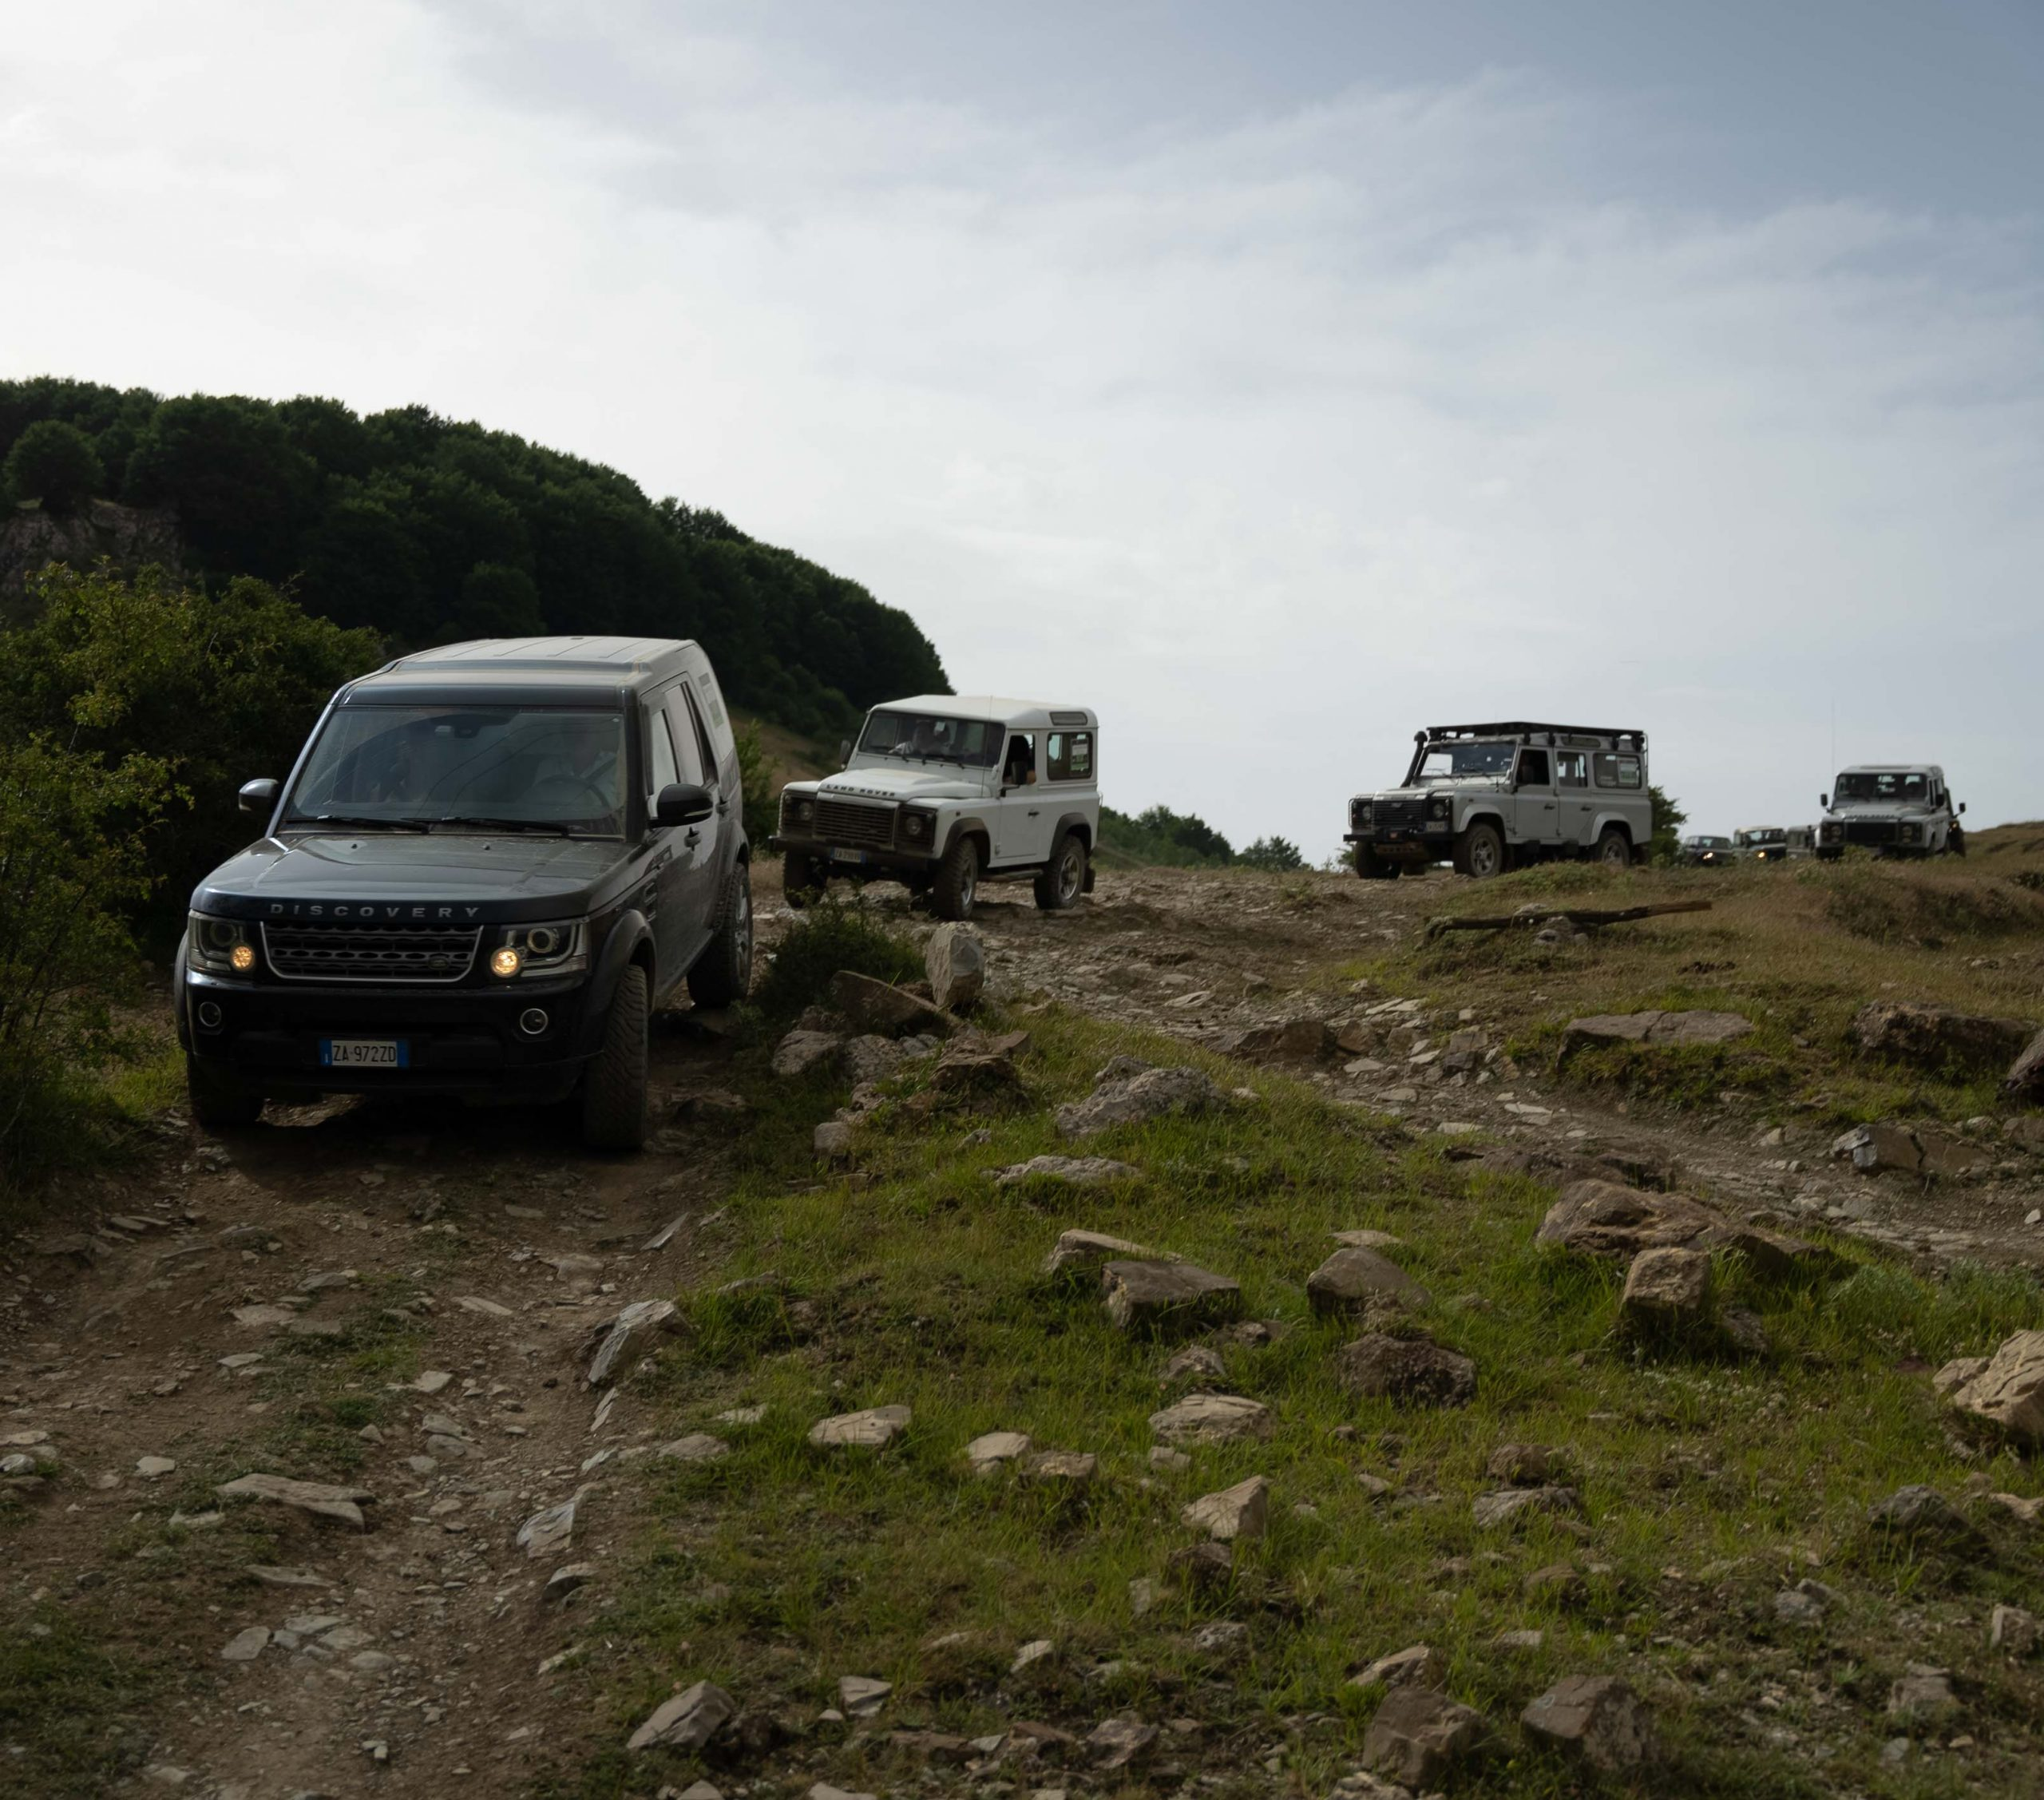 Land_Rover_Tour_Sicilia_2021_Land_Rover_Experience_Italia_-79